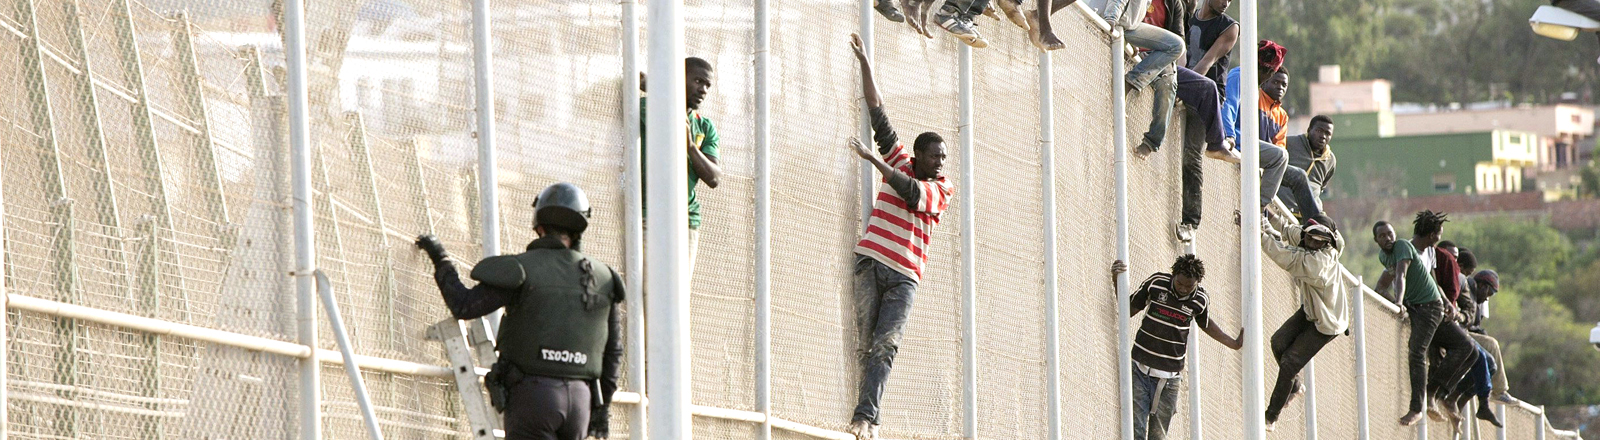 dpa: Flüchtlinge am Grenzzaun in Melilla